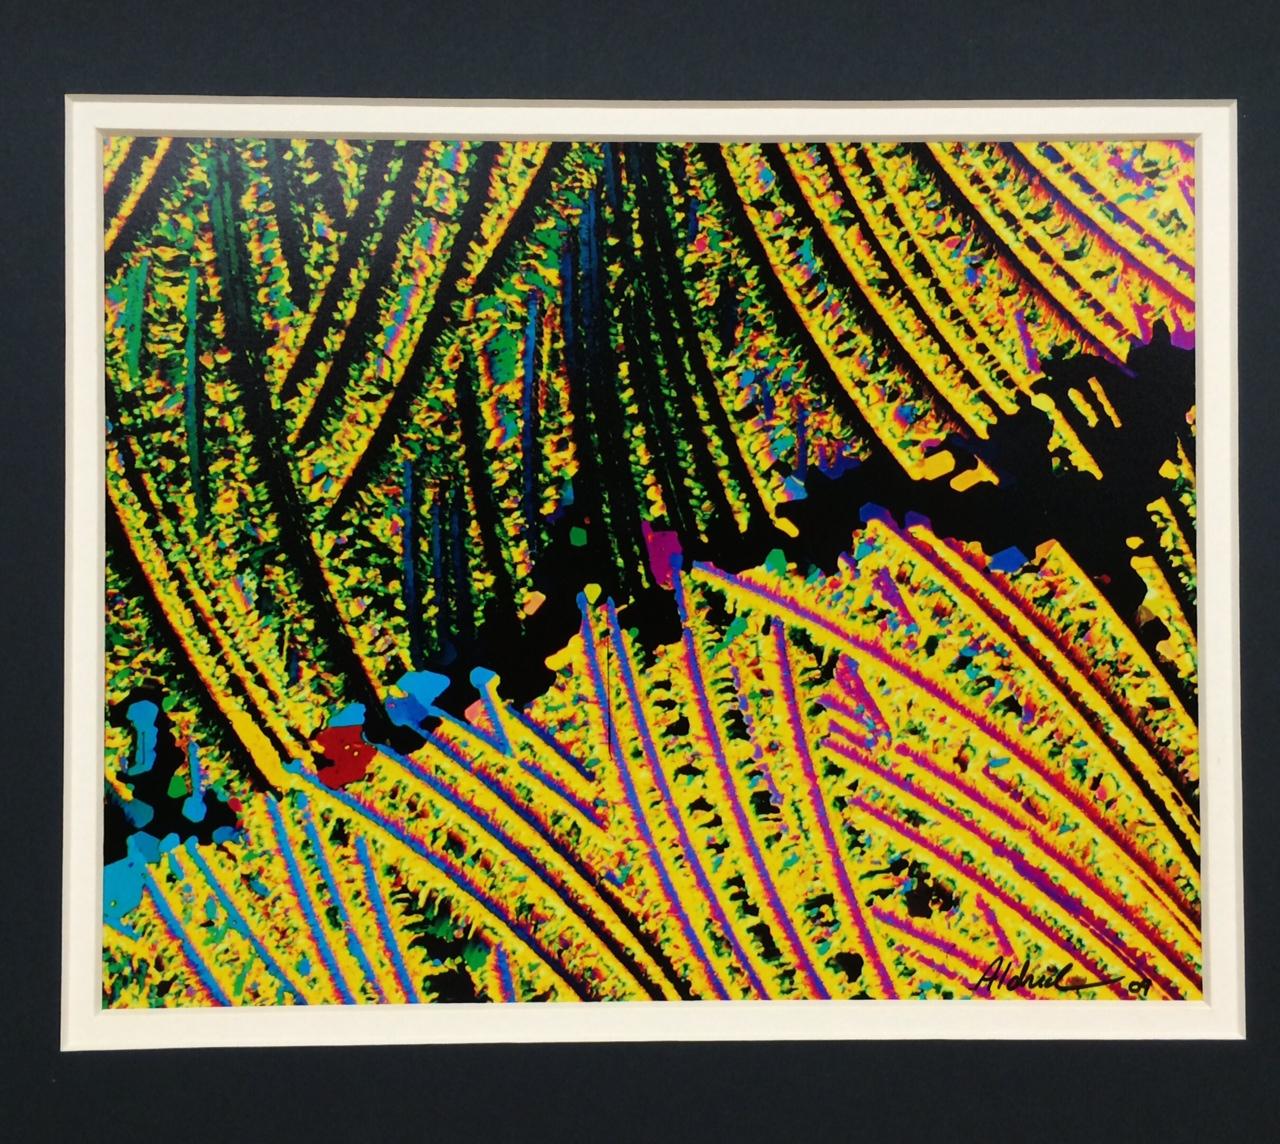 Tapestry by Scott Aldrich